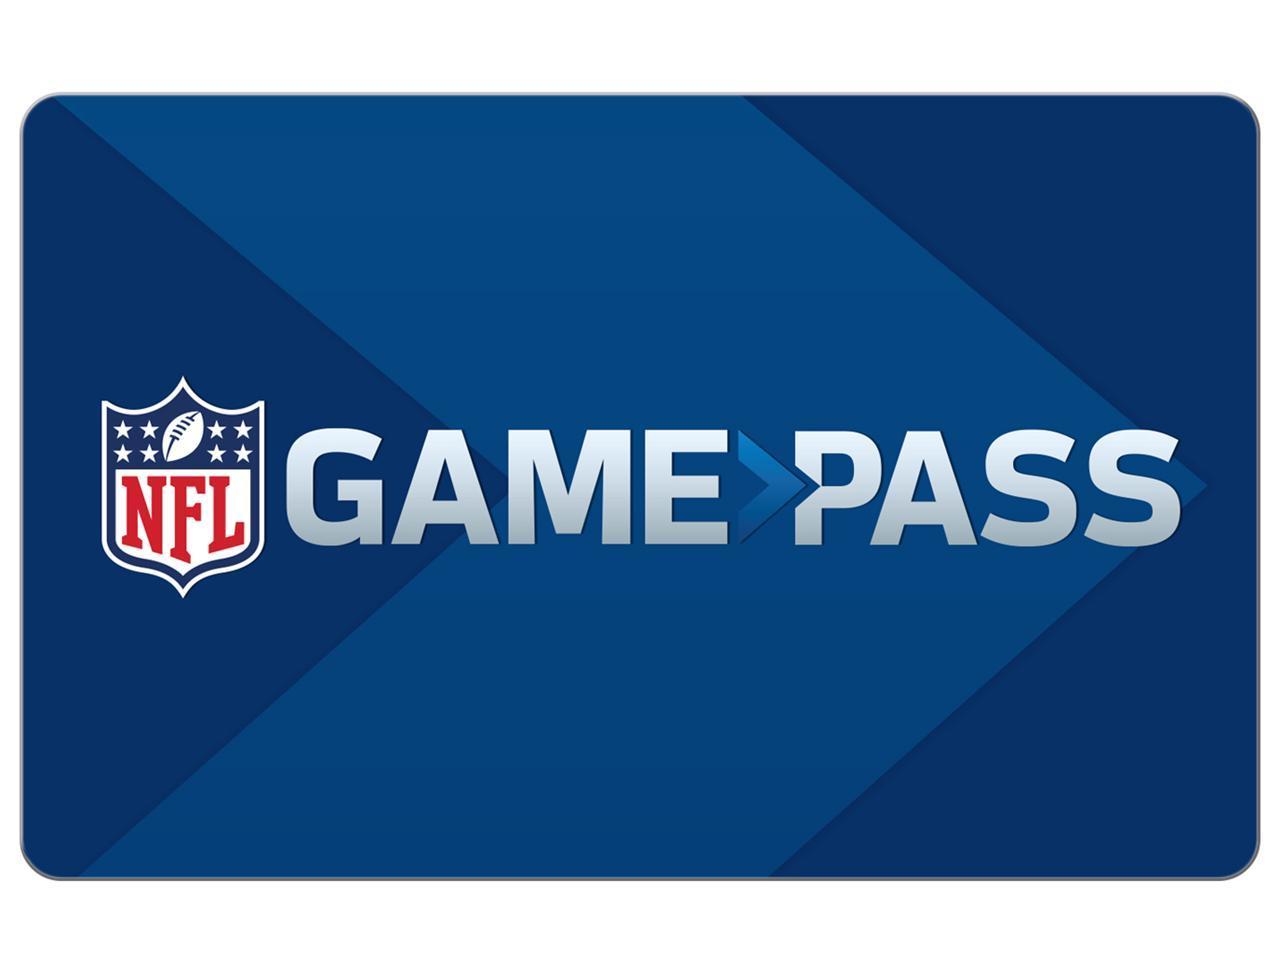 NFL Game Pass Season Long Access + Nike $50 Gift Card